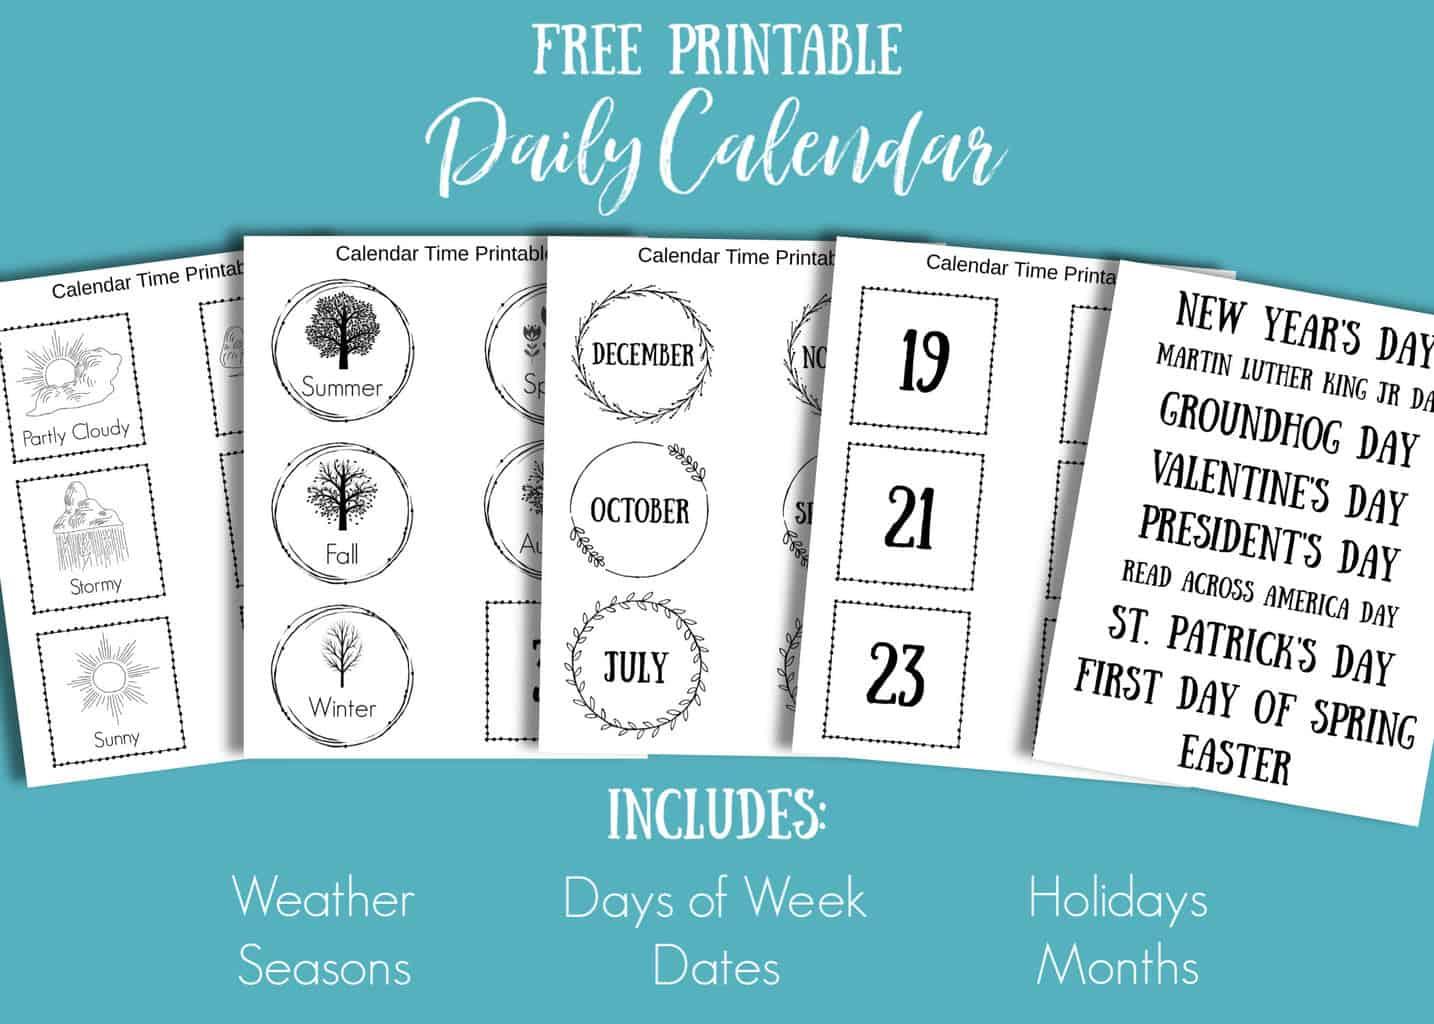 Free Printable Daily Calendar